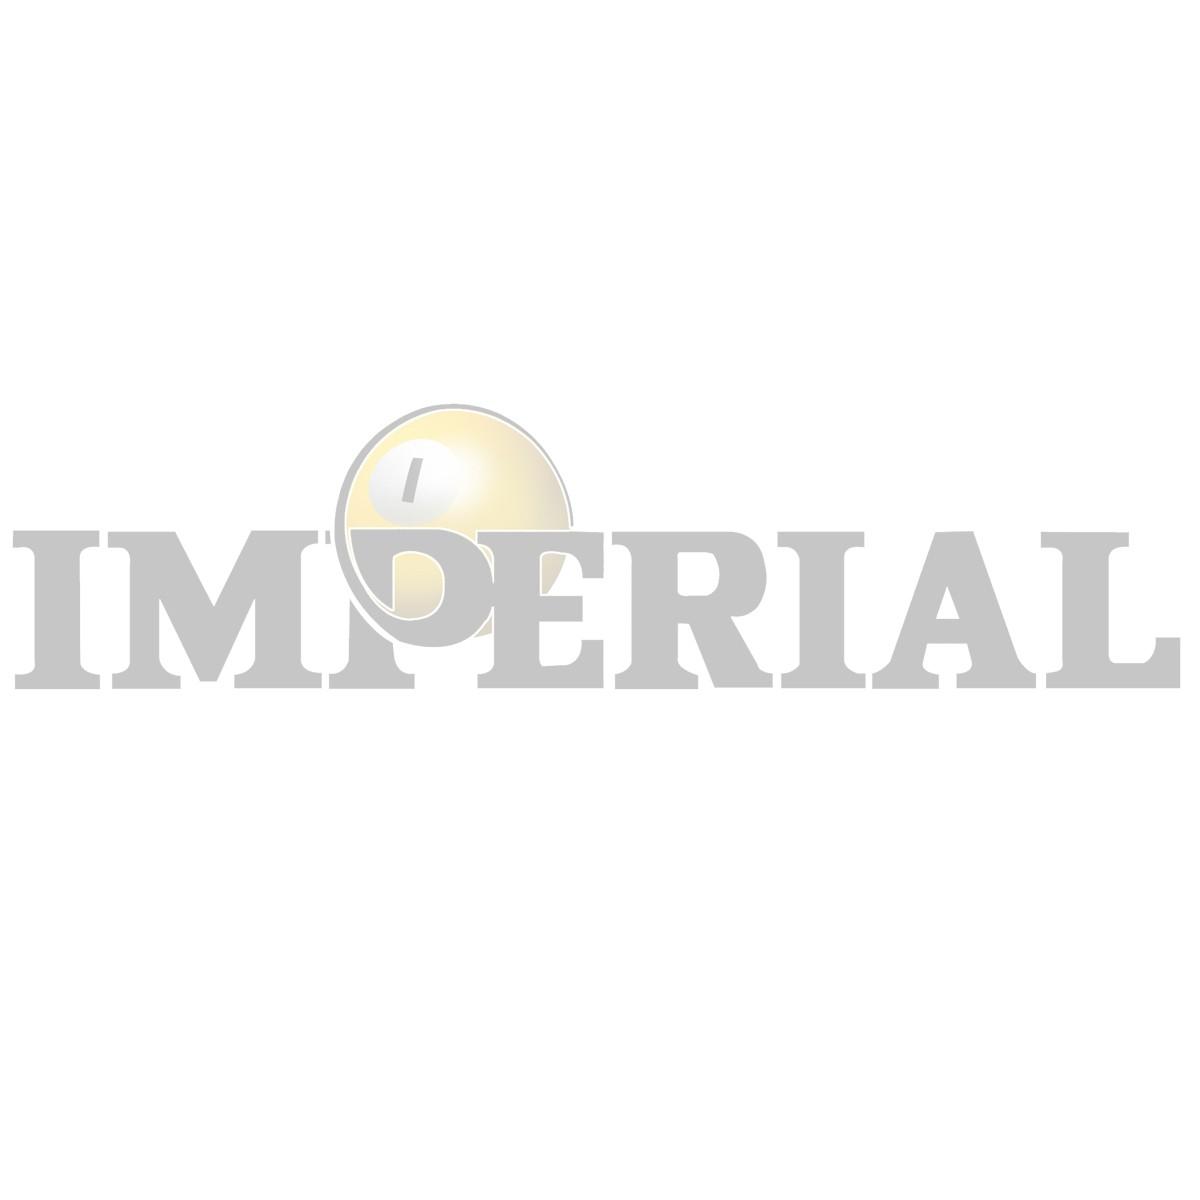 Oakland Raiders 9-foot Billiard Cloth